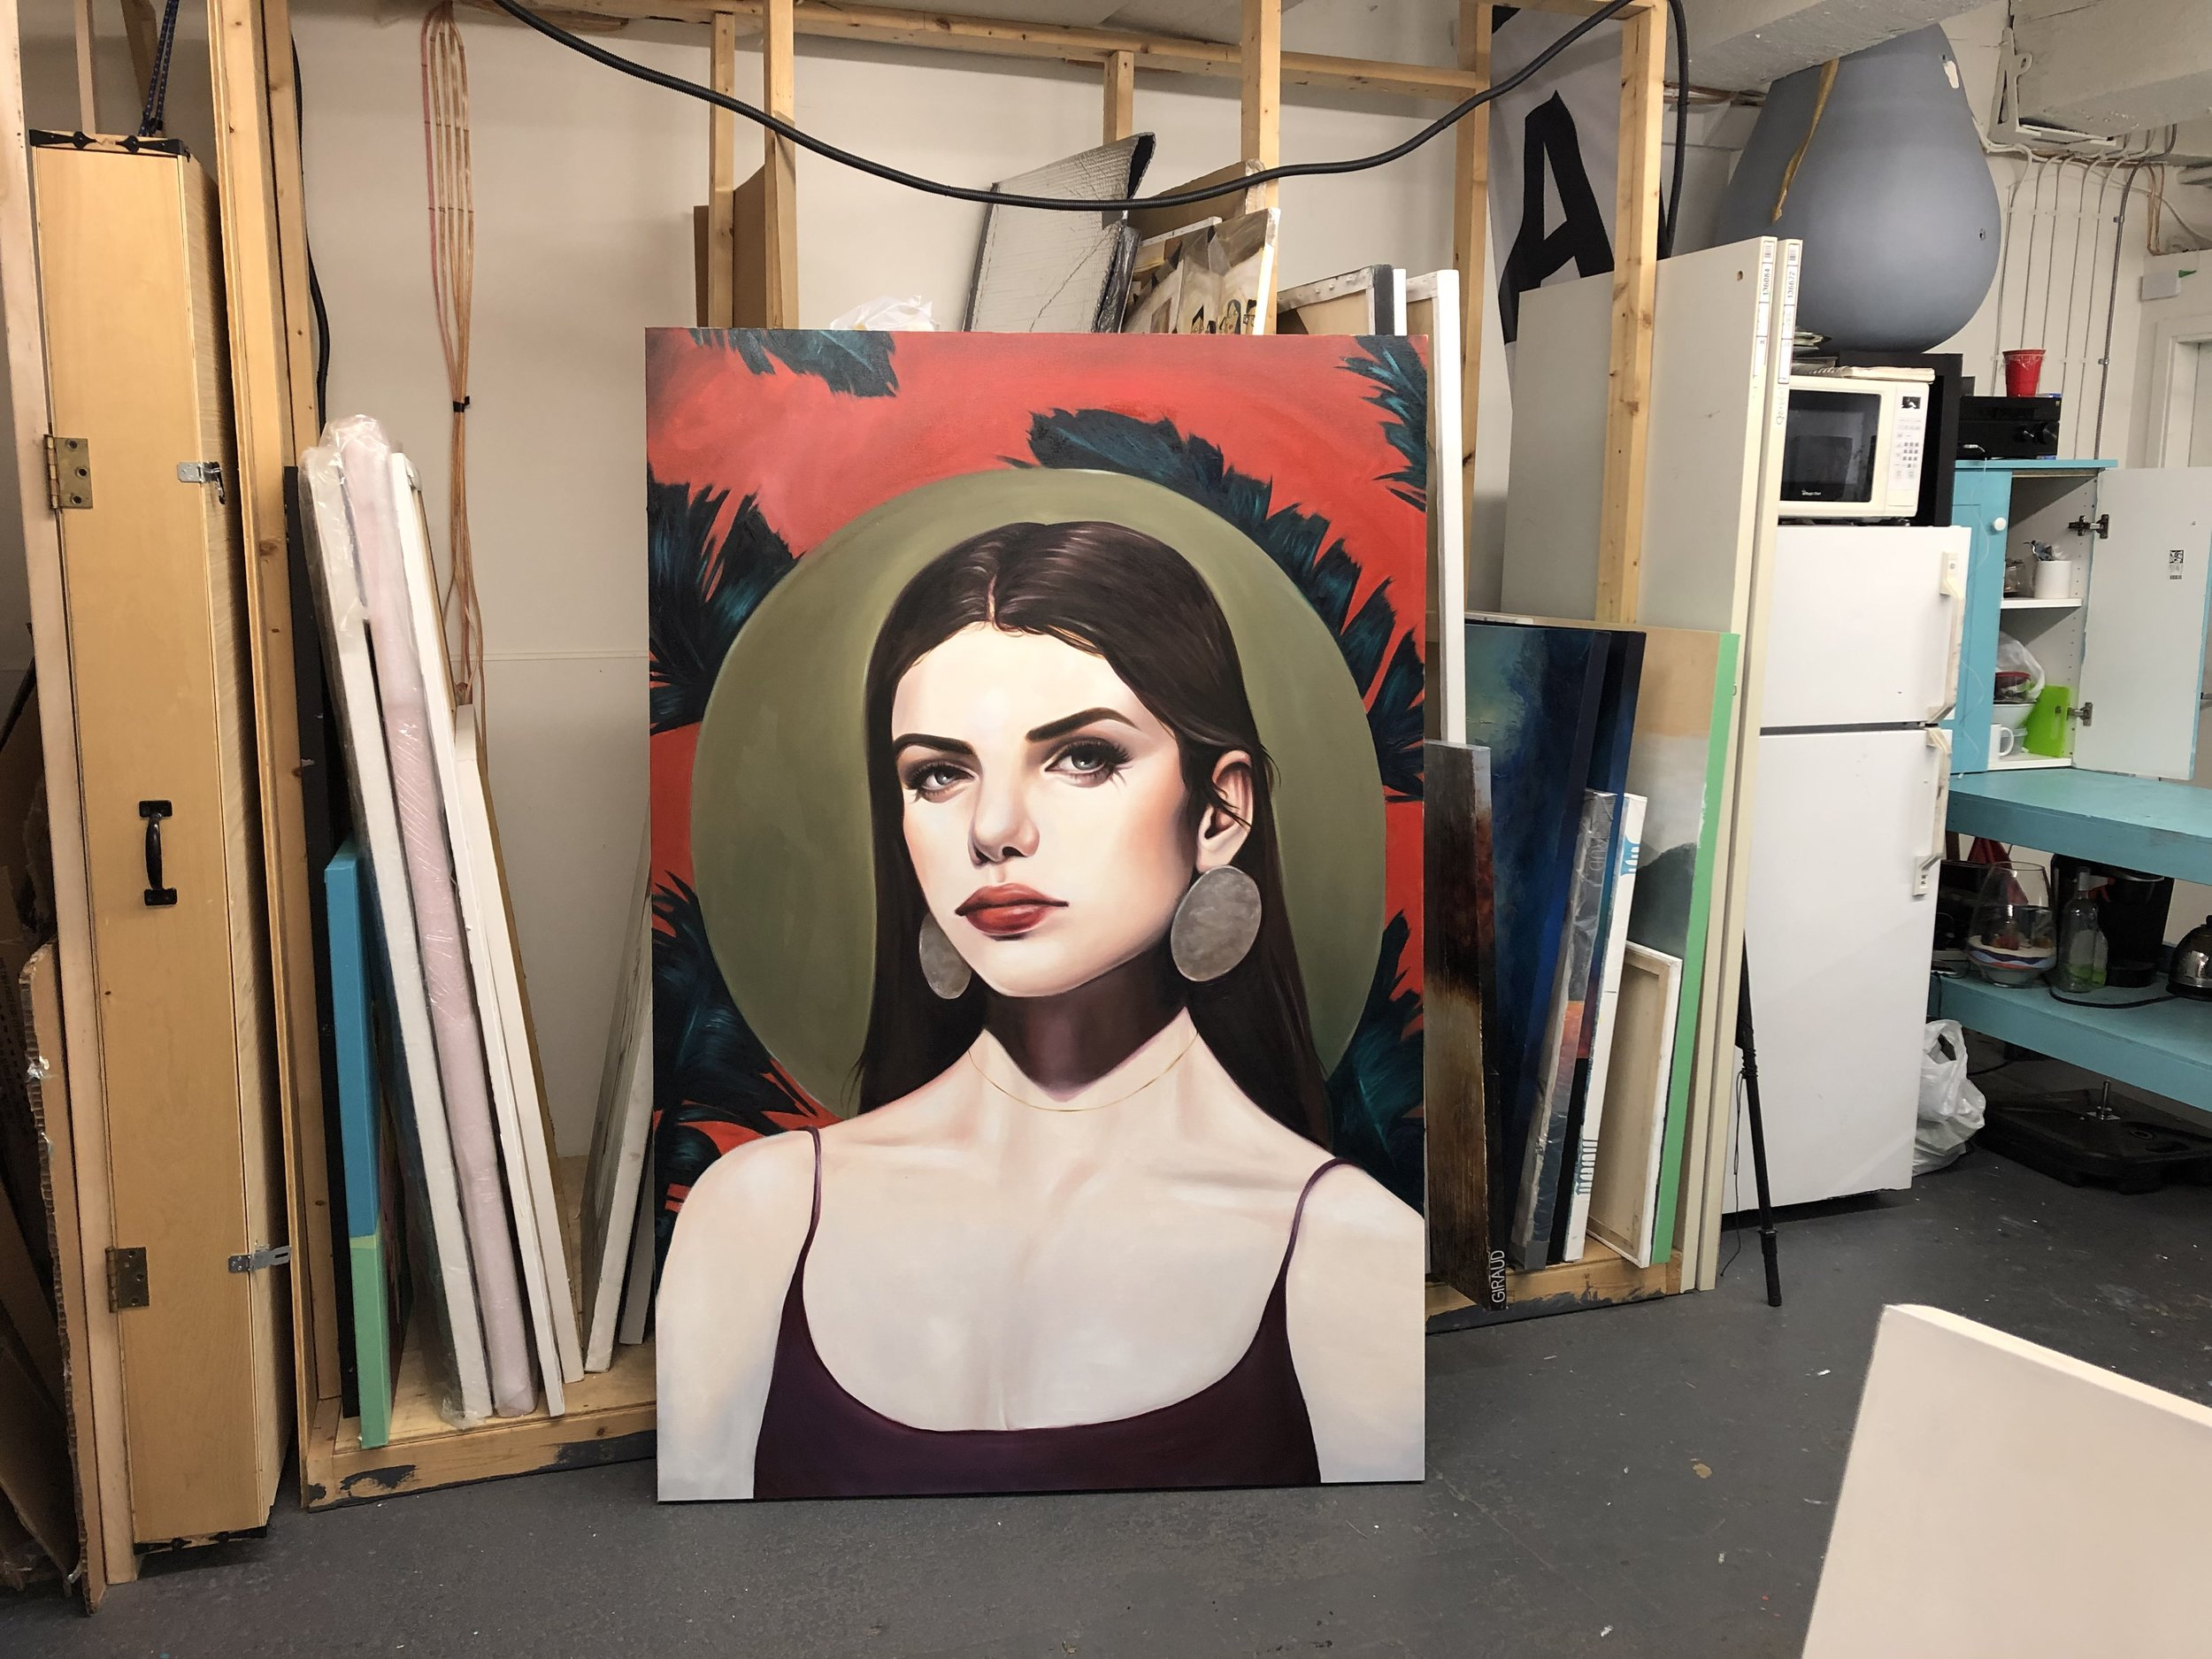 Commission for Studio Nightclub